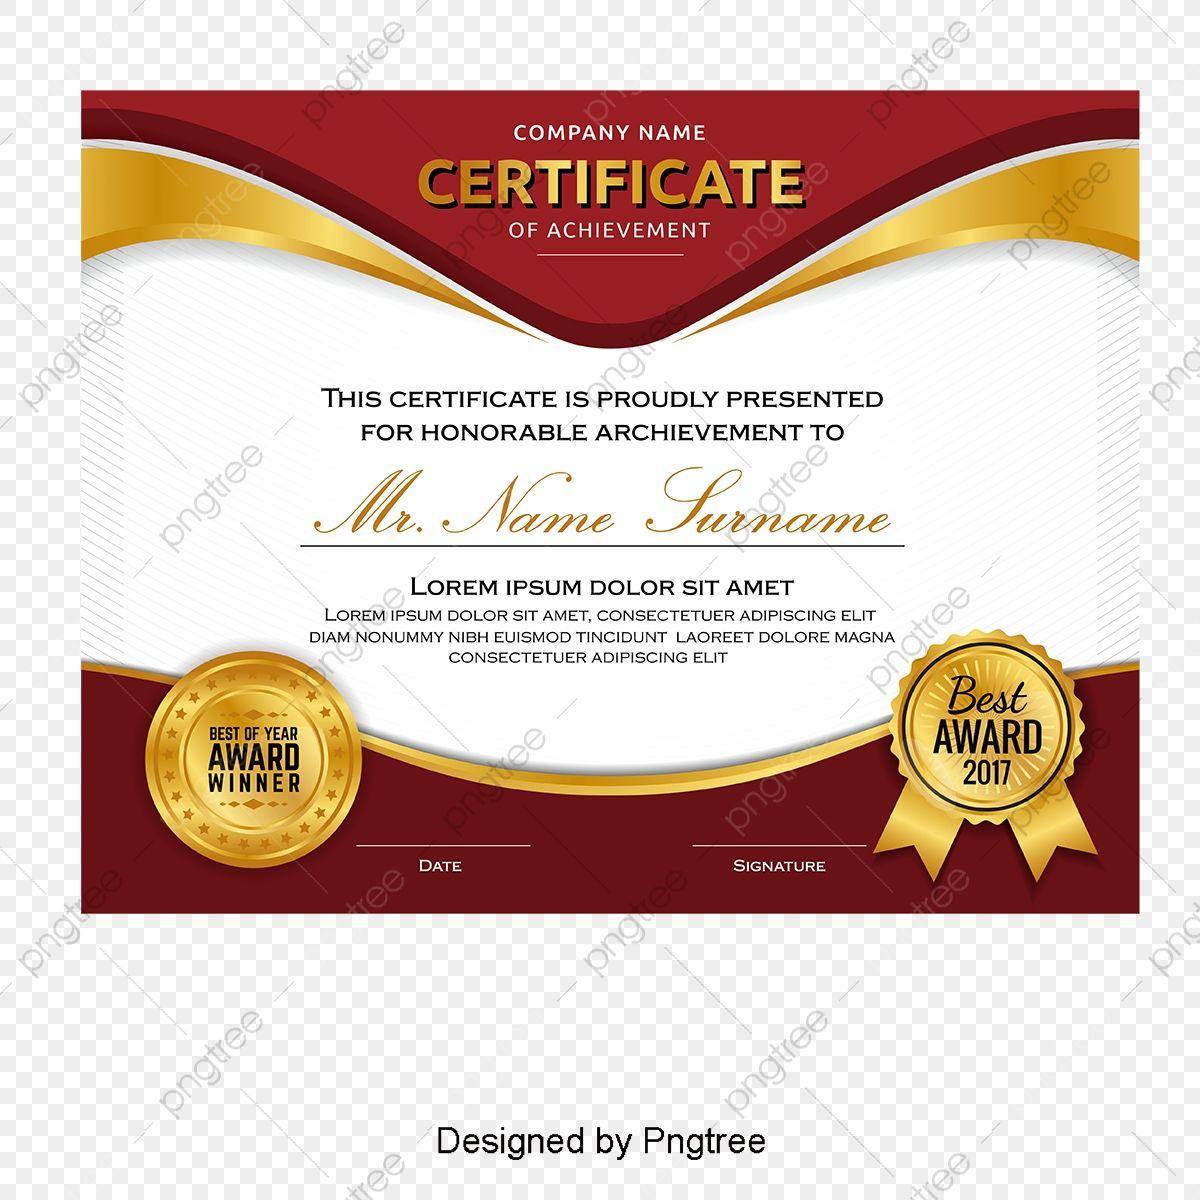 Atmospheric High End Certificate Certificate Template Training Certificate English Certificate Png And Vector With Transparent Background For Free Download Sertifikat Penghargaan Desain Pamflet Brosur